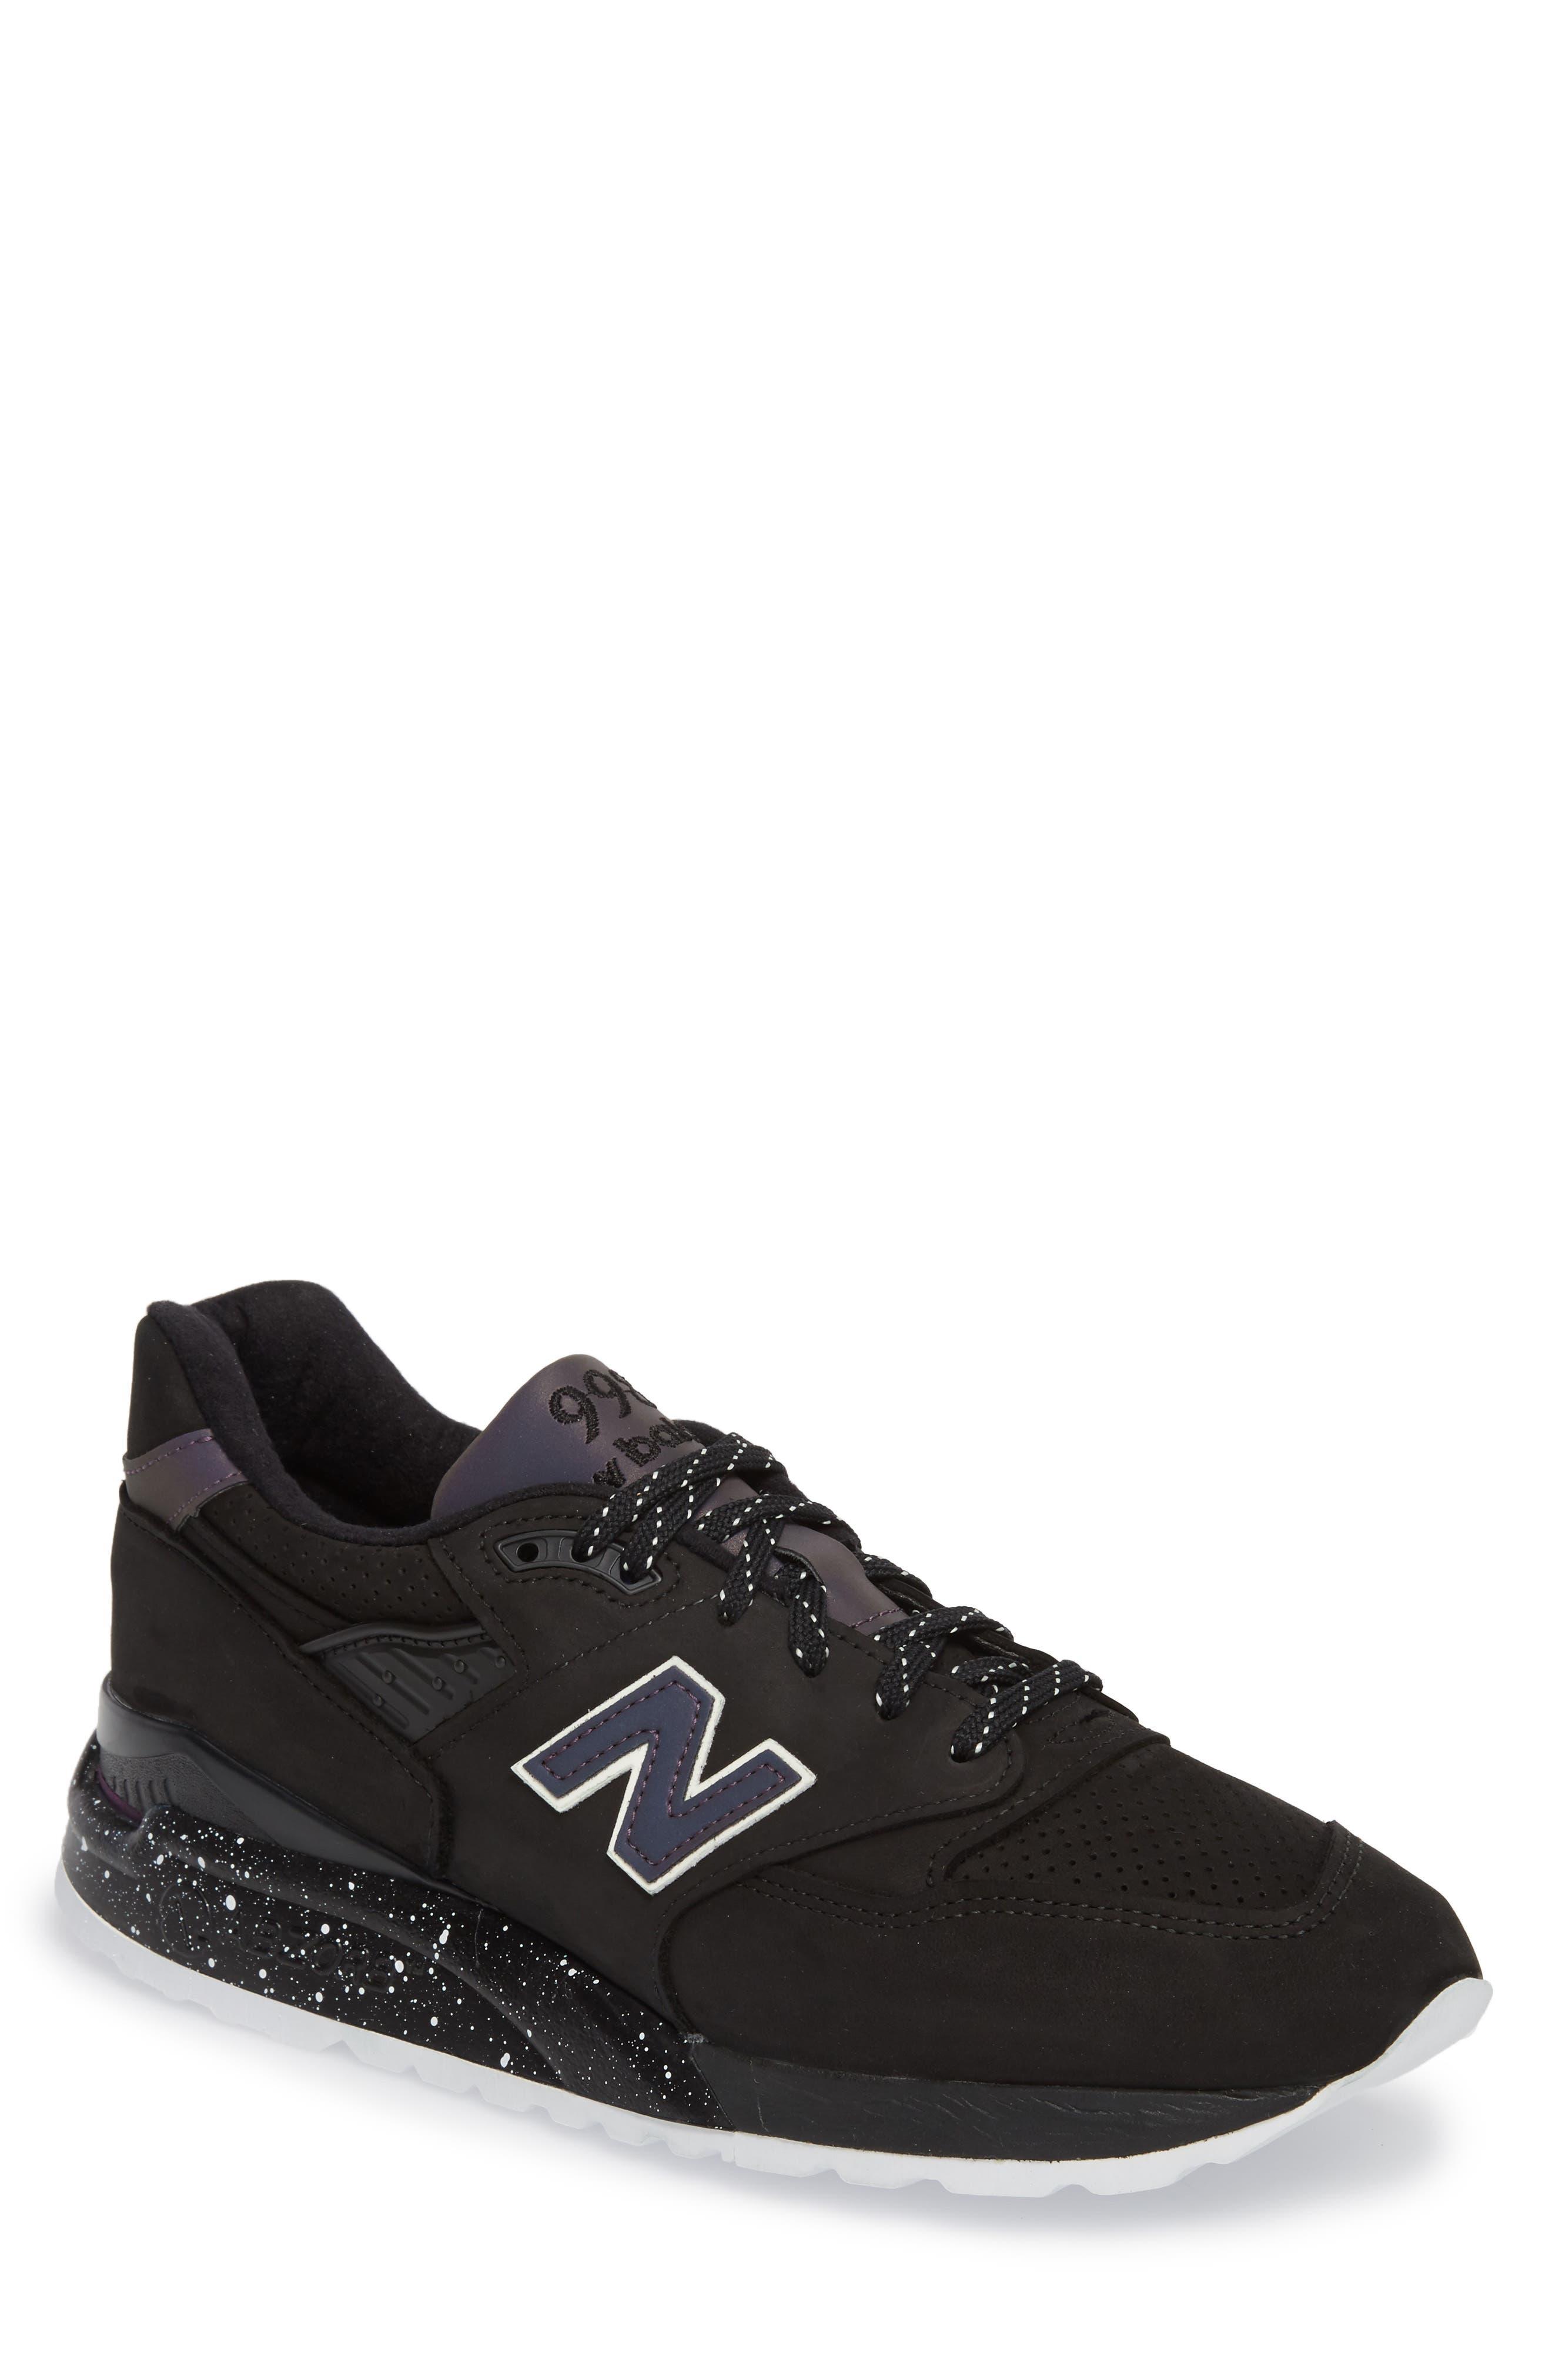 Main Image - New Balance 998 Sneaker (Men)